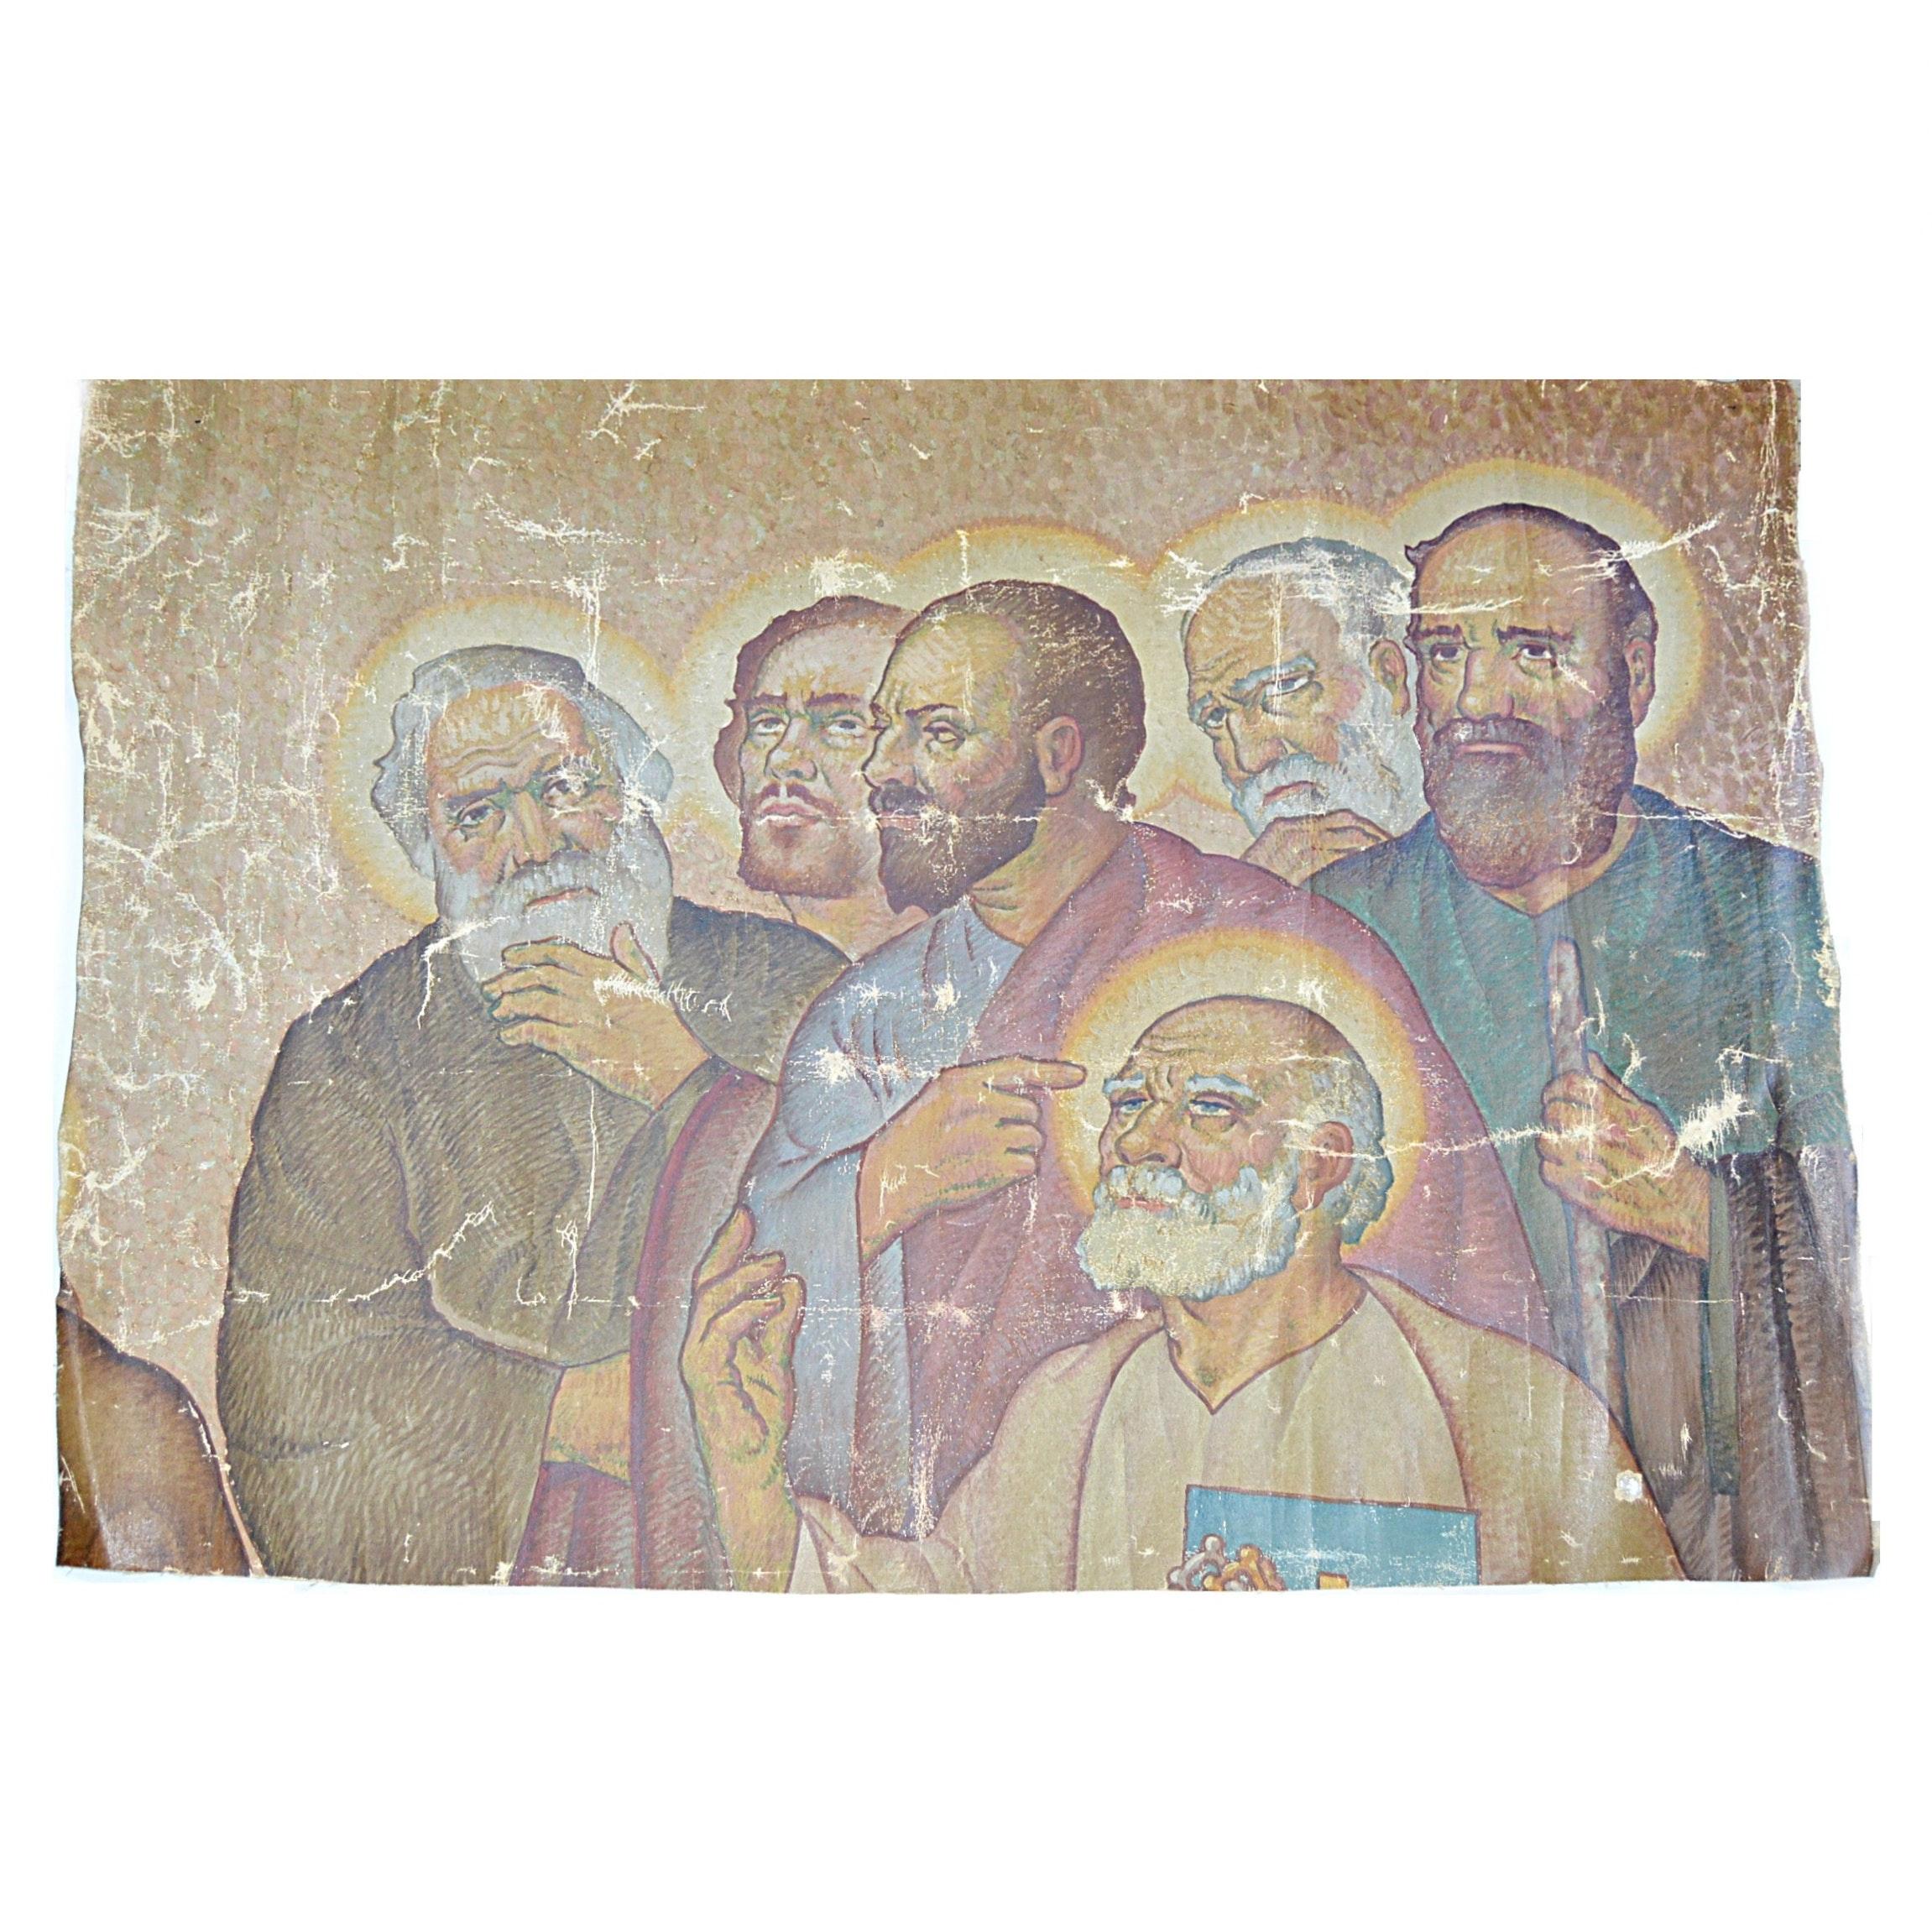 19th Century Ecclesiastical Oil on Canvas Mural Fragment